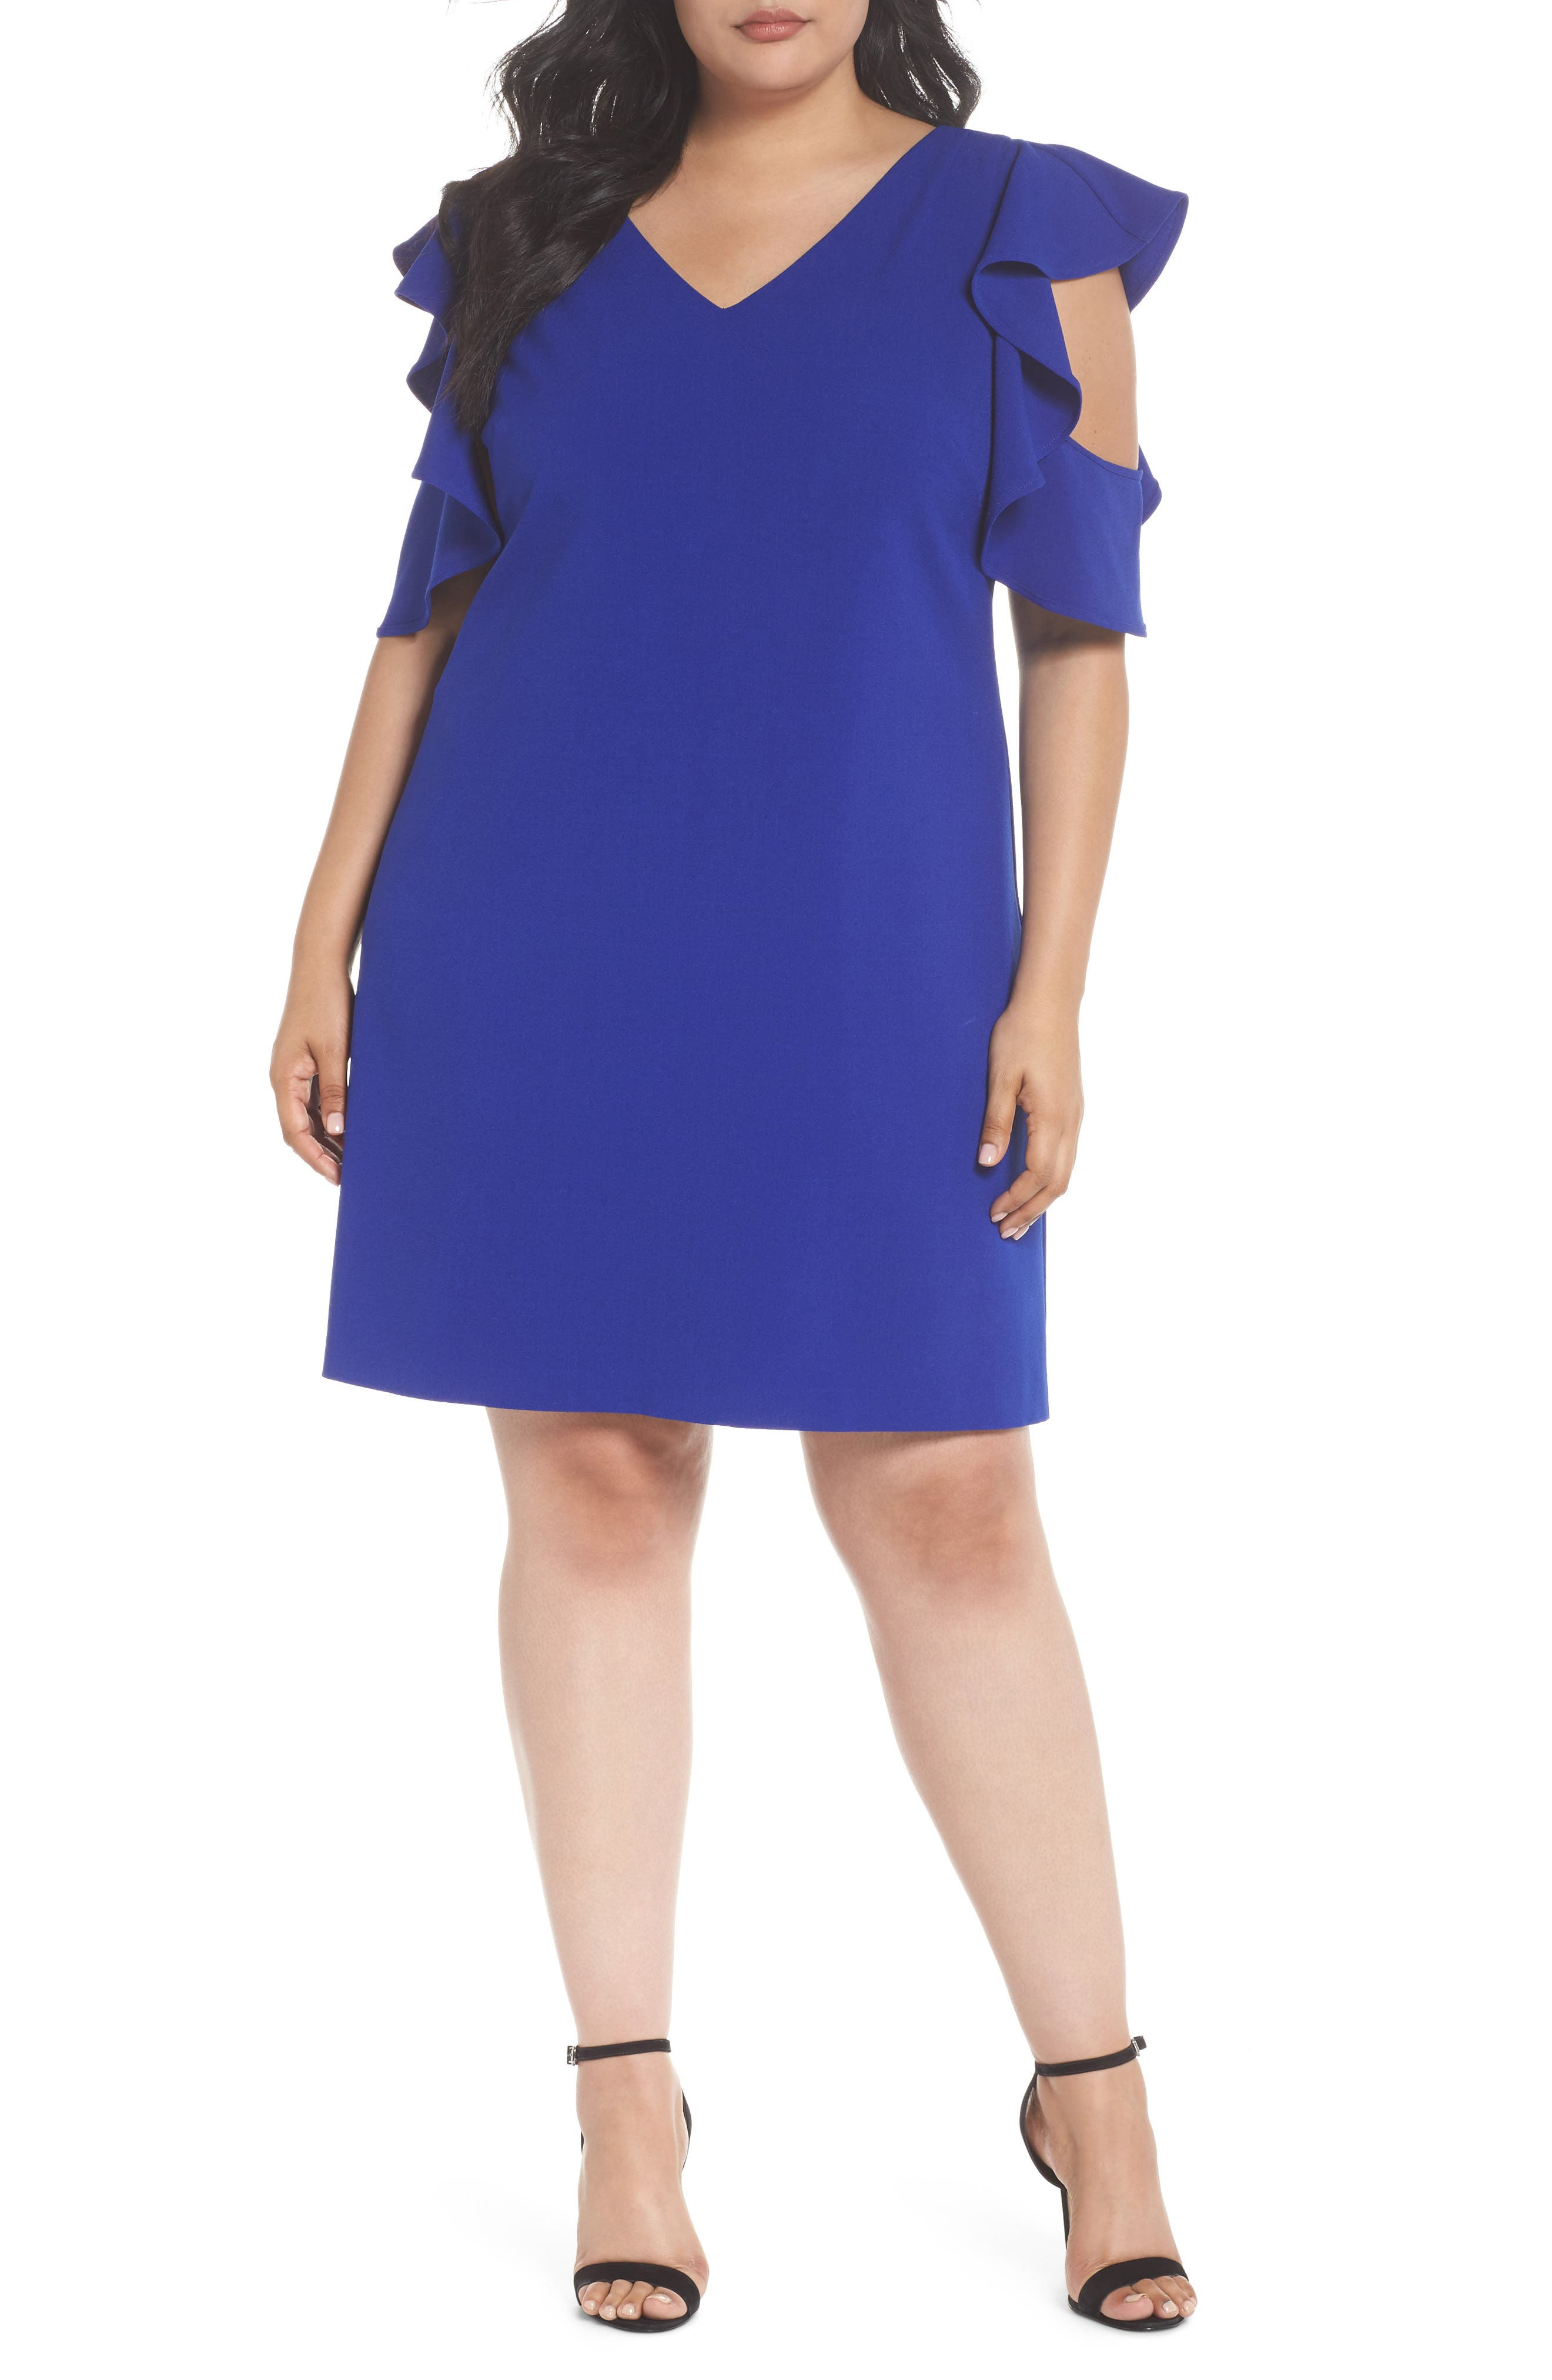 Alternate Image 1 Selected - Chelsea28 Ruffle Cold Shoulder Shift Dress (Plus Size)